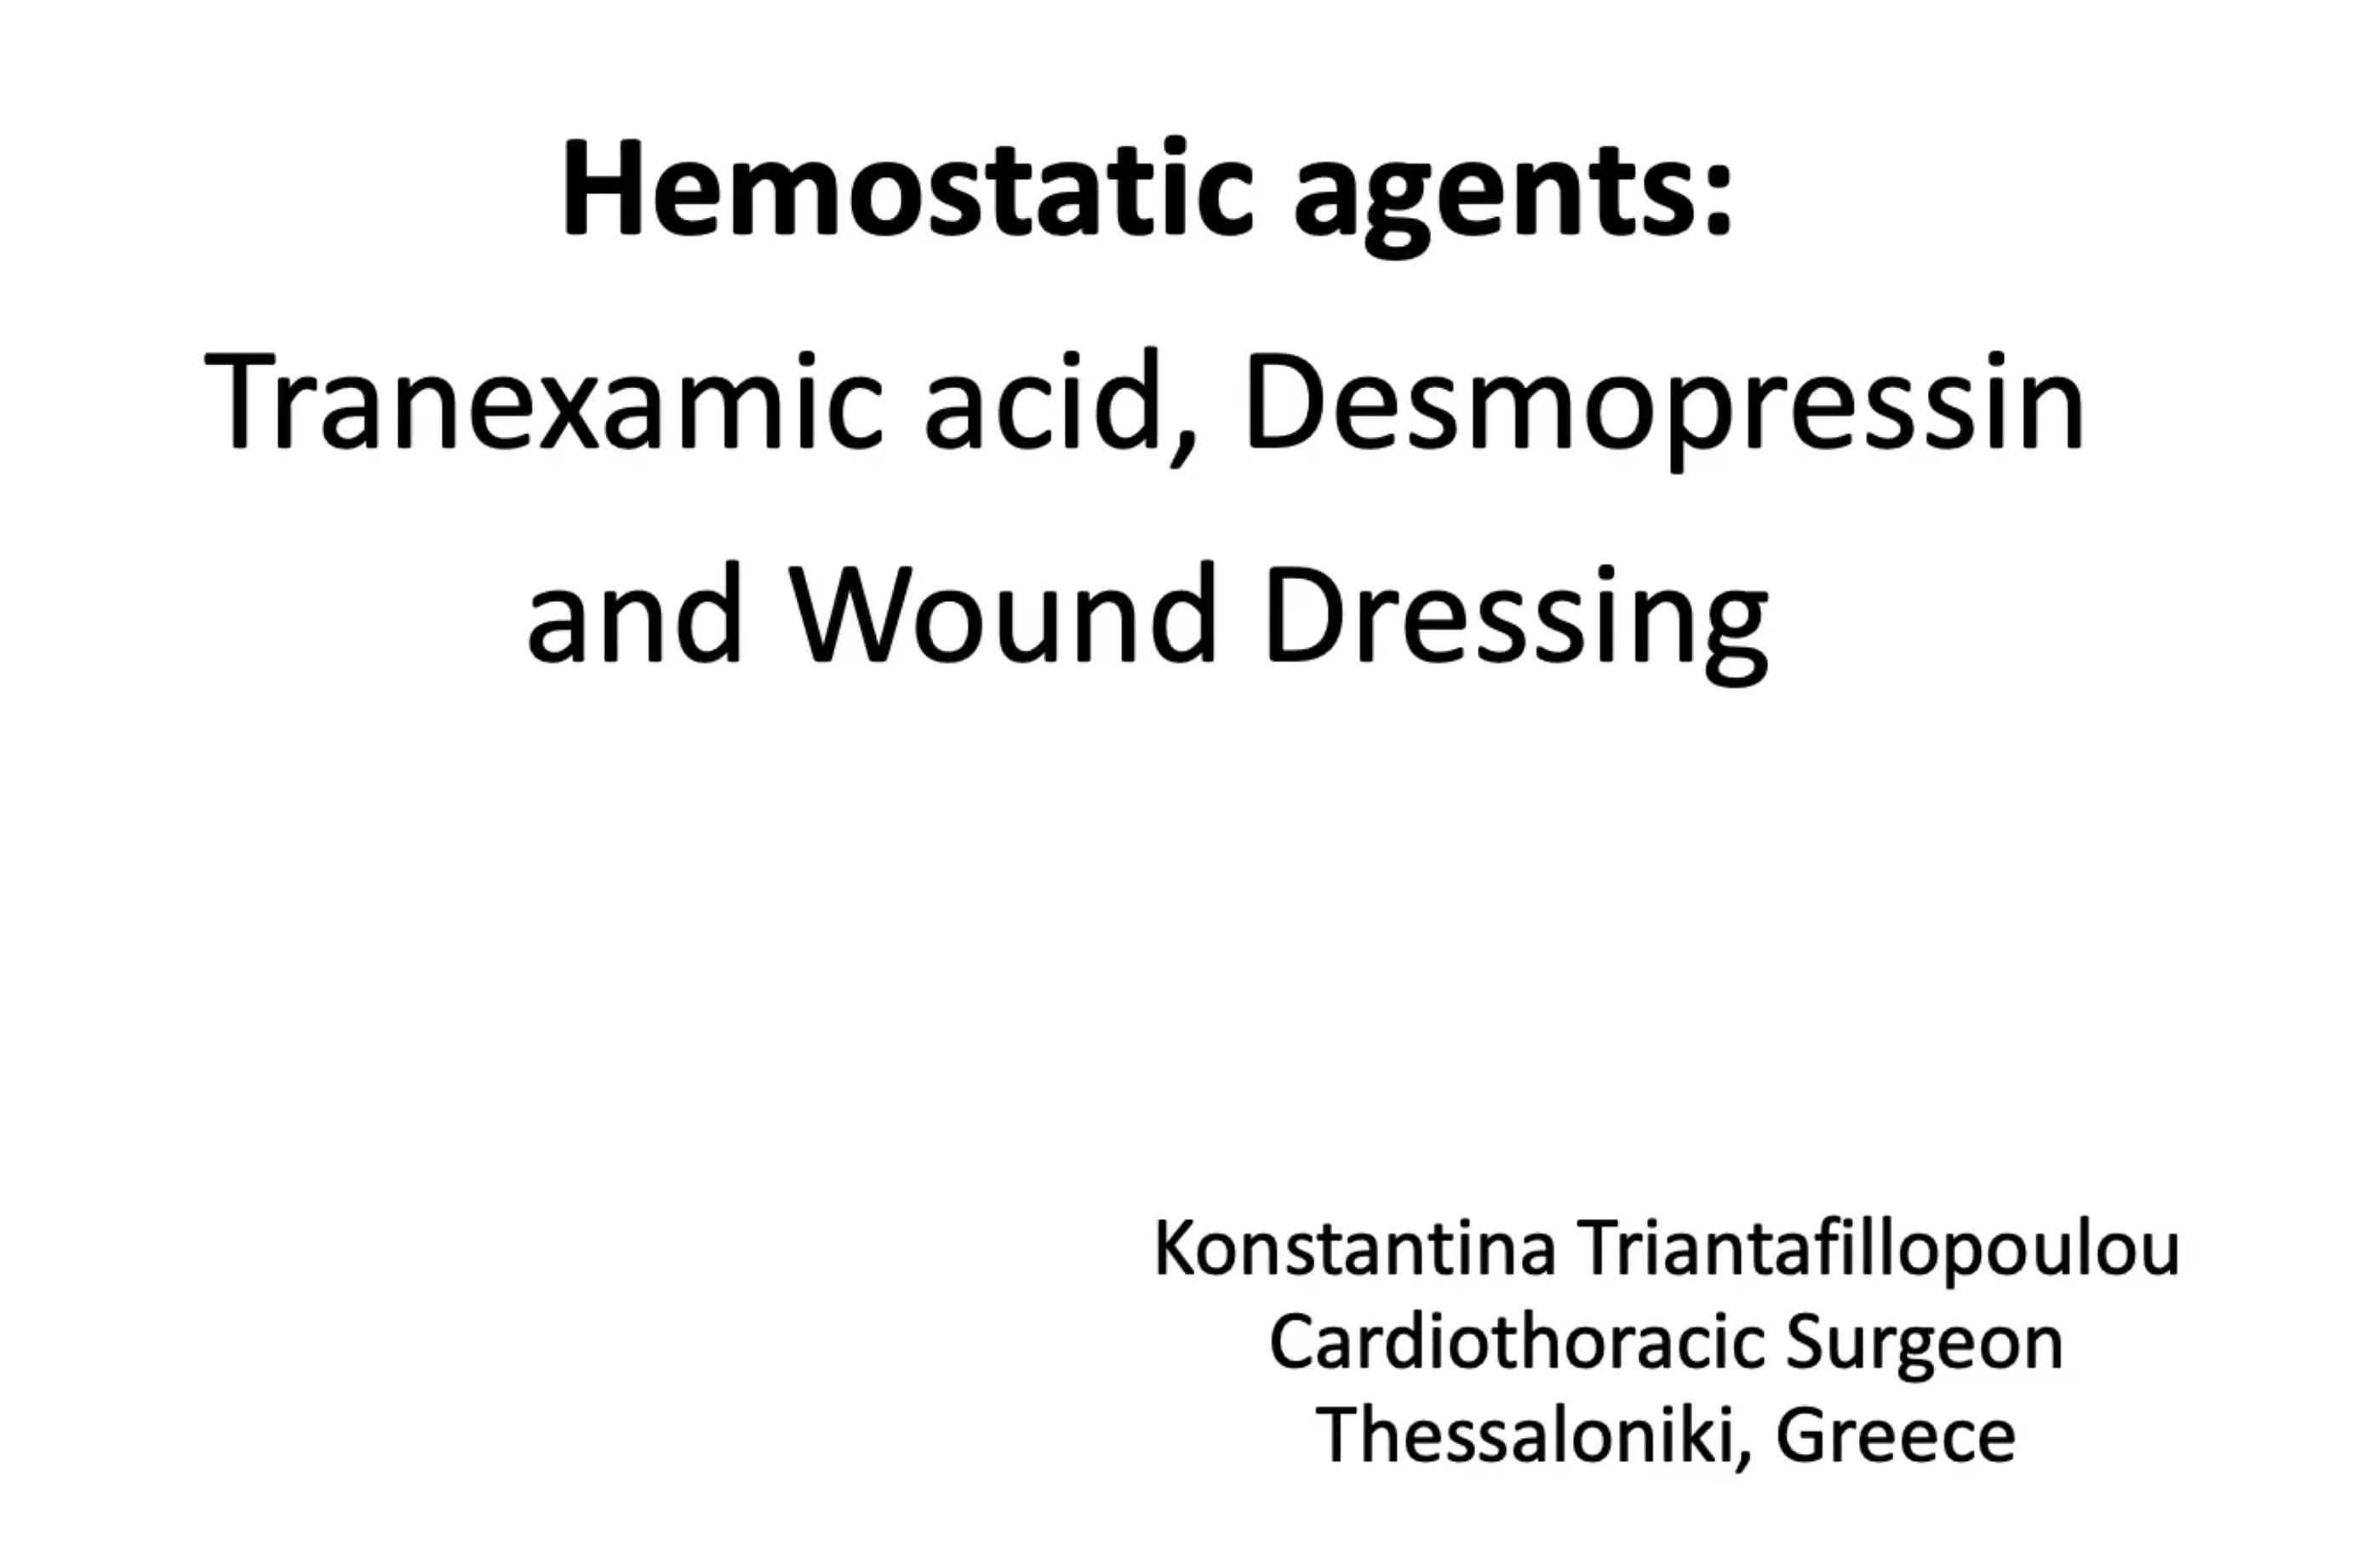 Tina Triantafyllopulou - Hemostatic agents - TXA, Desmopressin, Wound Dressings